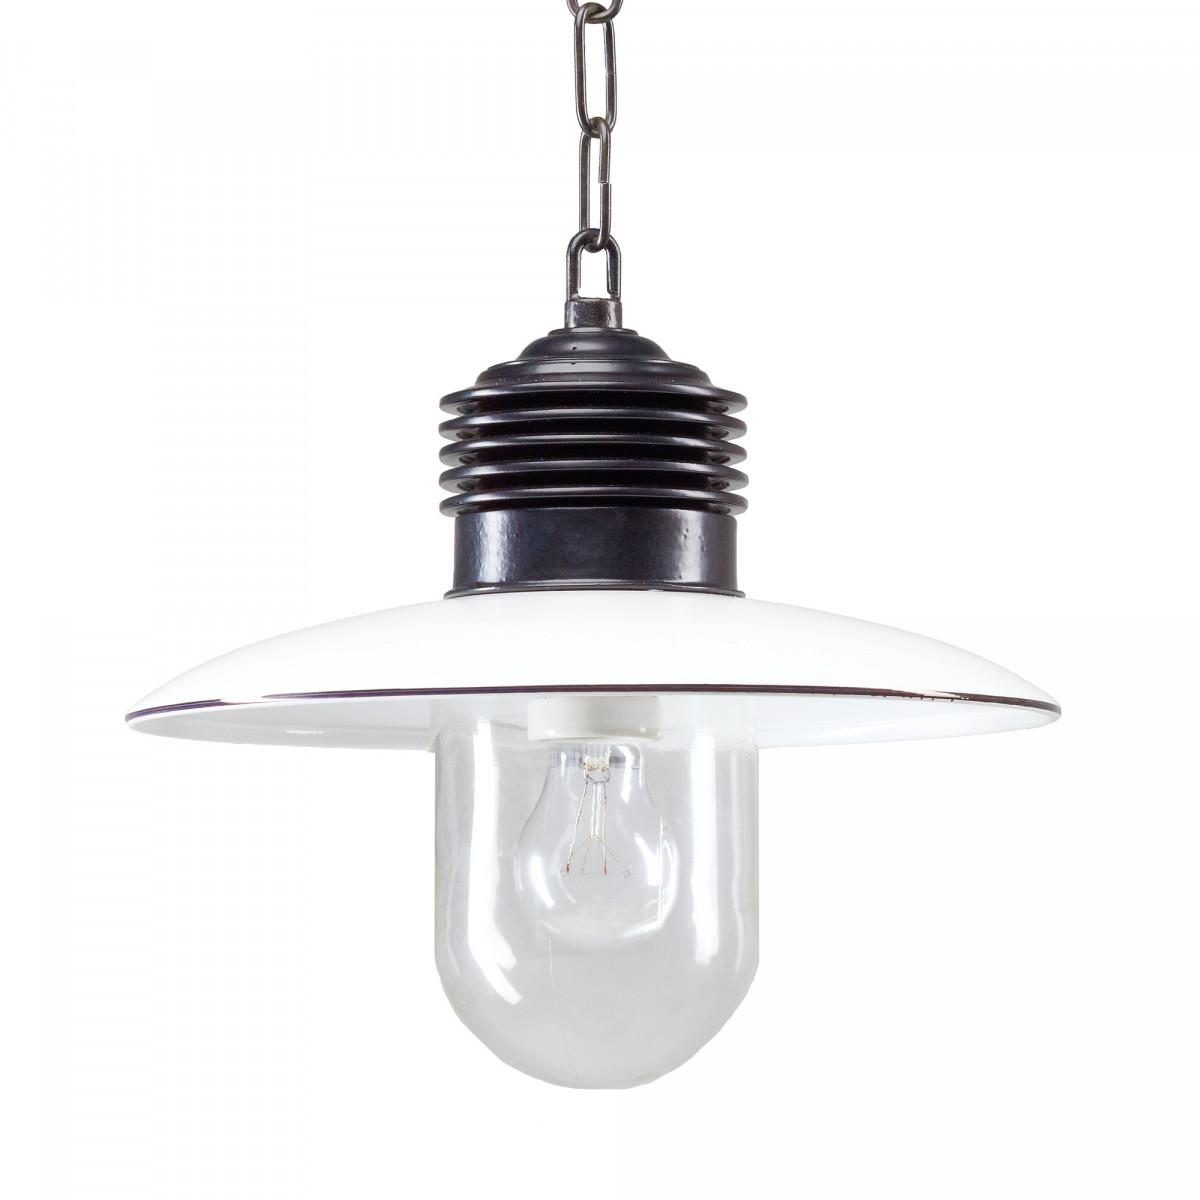 Hanglamp Ampere ketting Zwart/Wit (1187) - KS Verlichting - Stoer & Industrieel